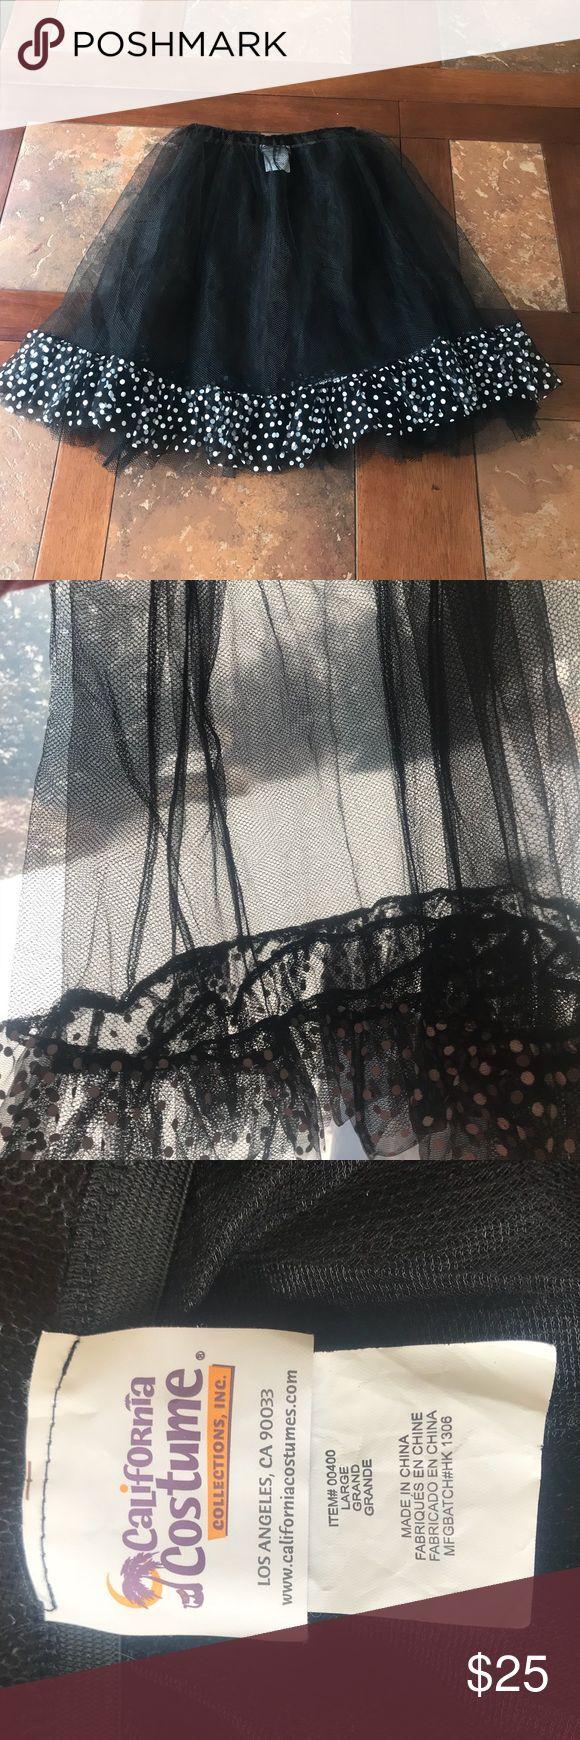 California Costumes Mesh ruffle skirt Black mesh skirt with elastic waistband and polkadot ruffle at the bottom  Can be worn over or under something California Costumes Skirts Midi